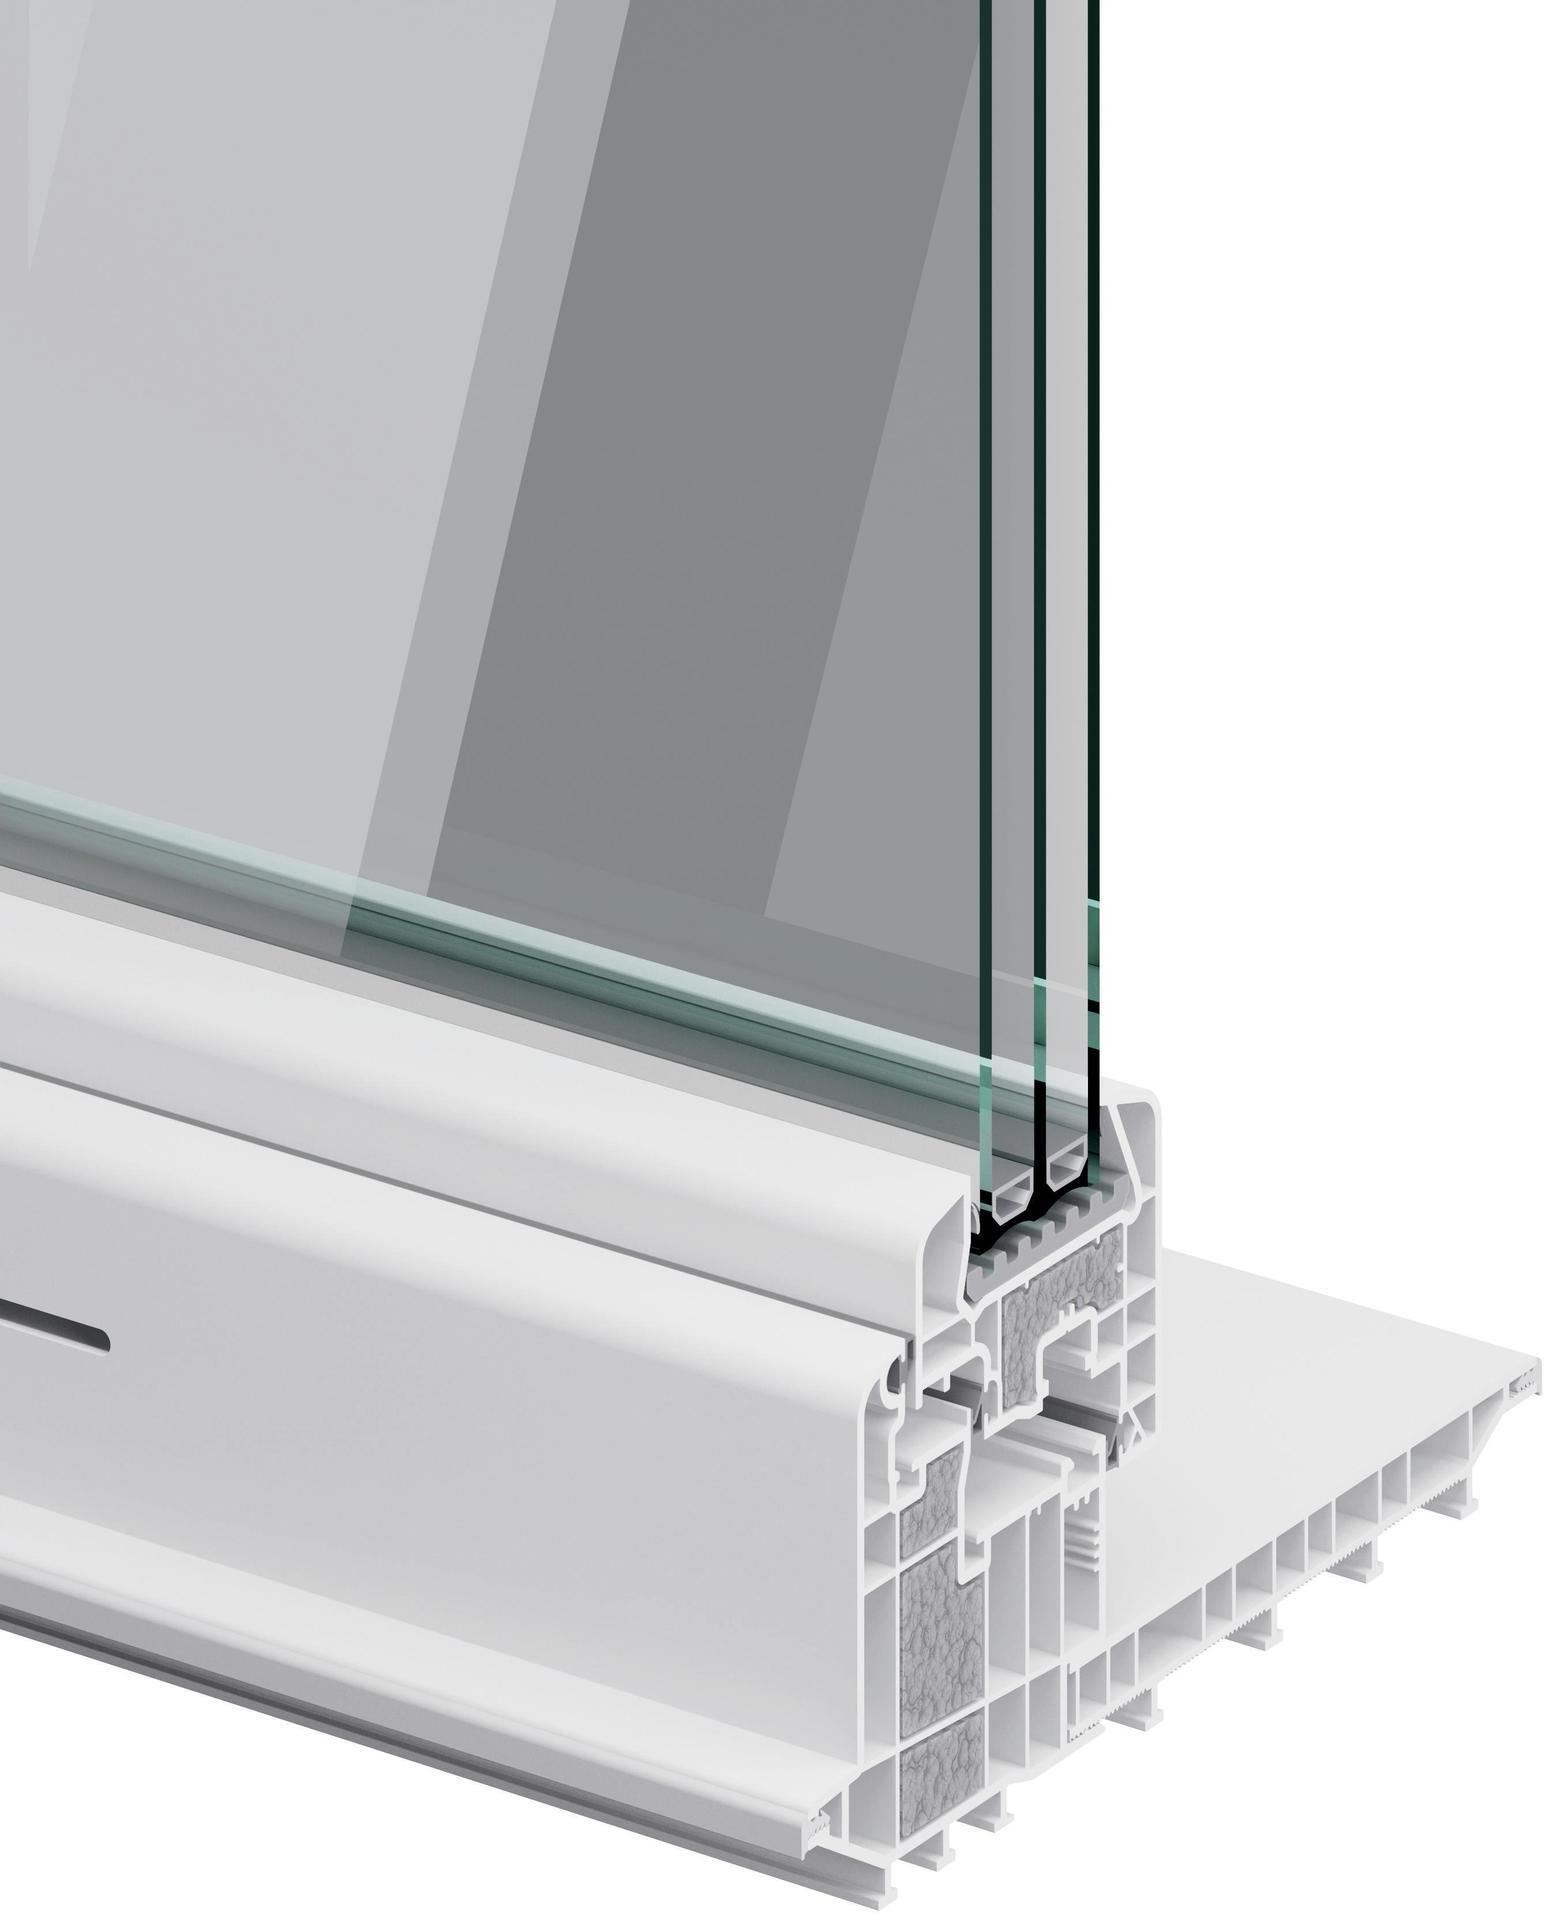 aco therm 3 0 leibungsfenster f r den keller ais. Black Bedroom Furniture Sets. Home Design Ideas